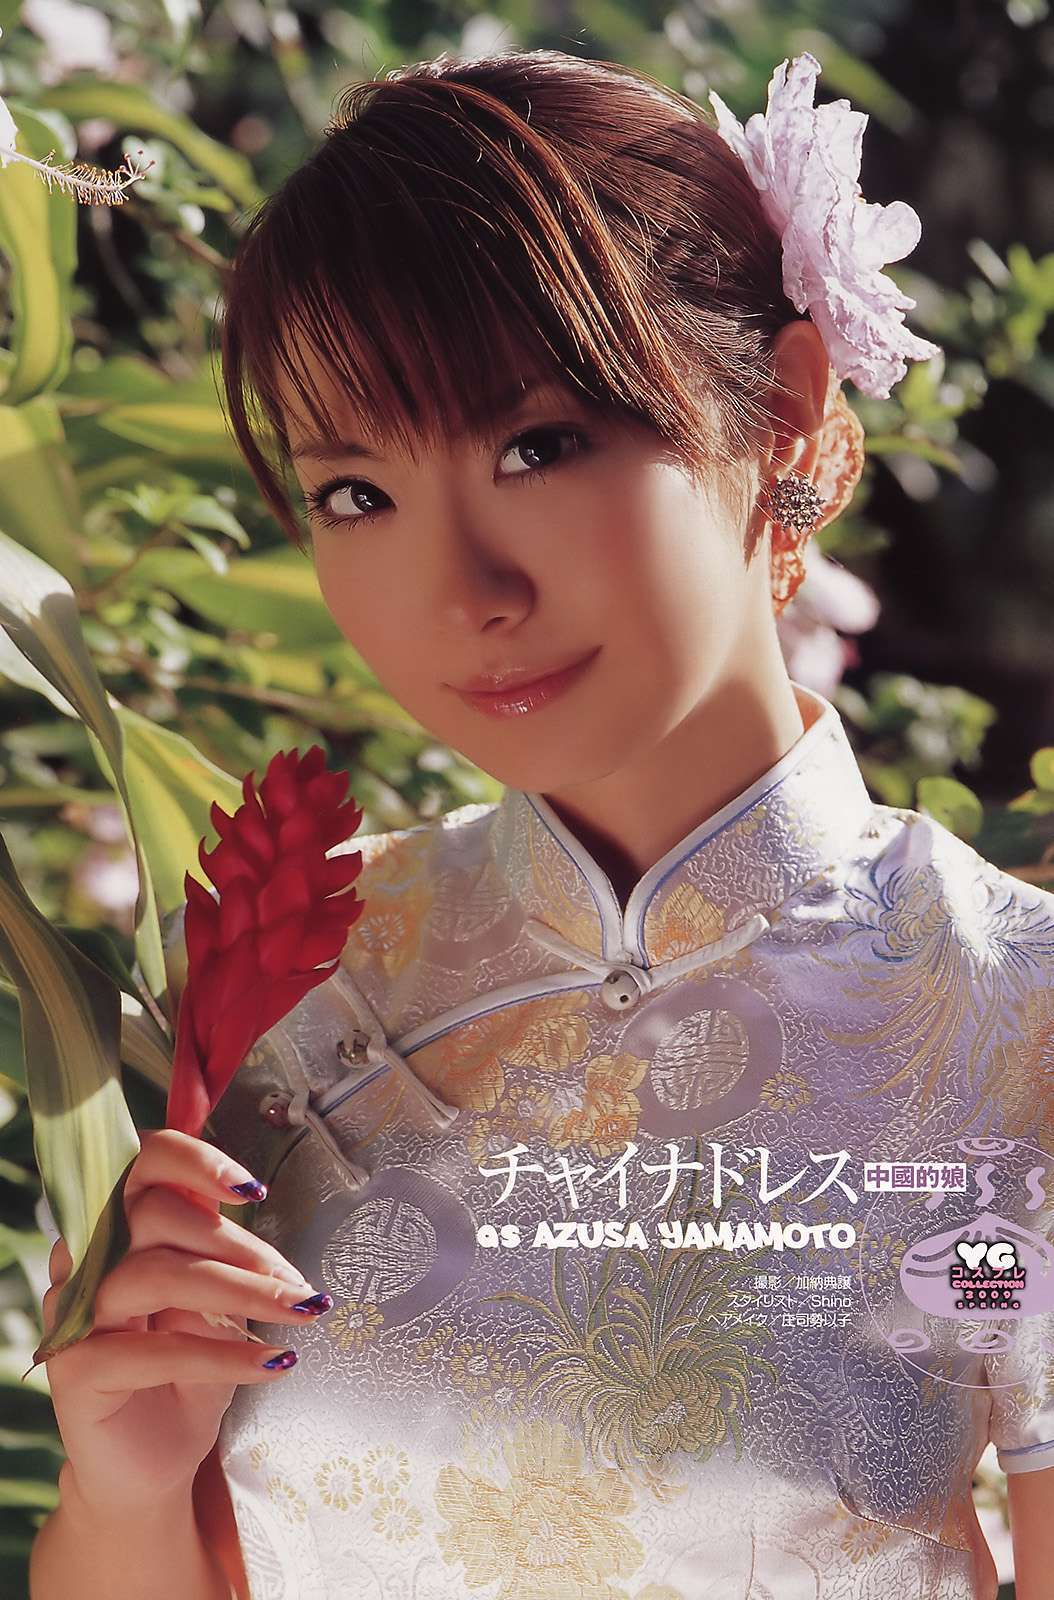 yamamoto_azusa159.jpg